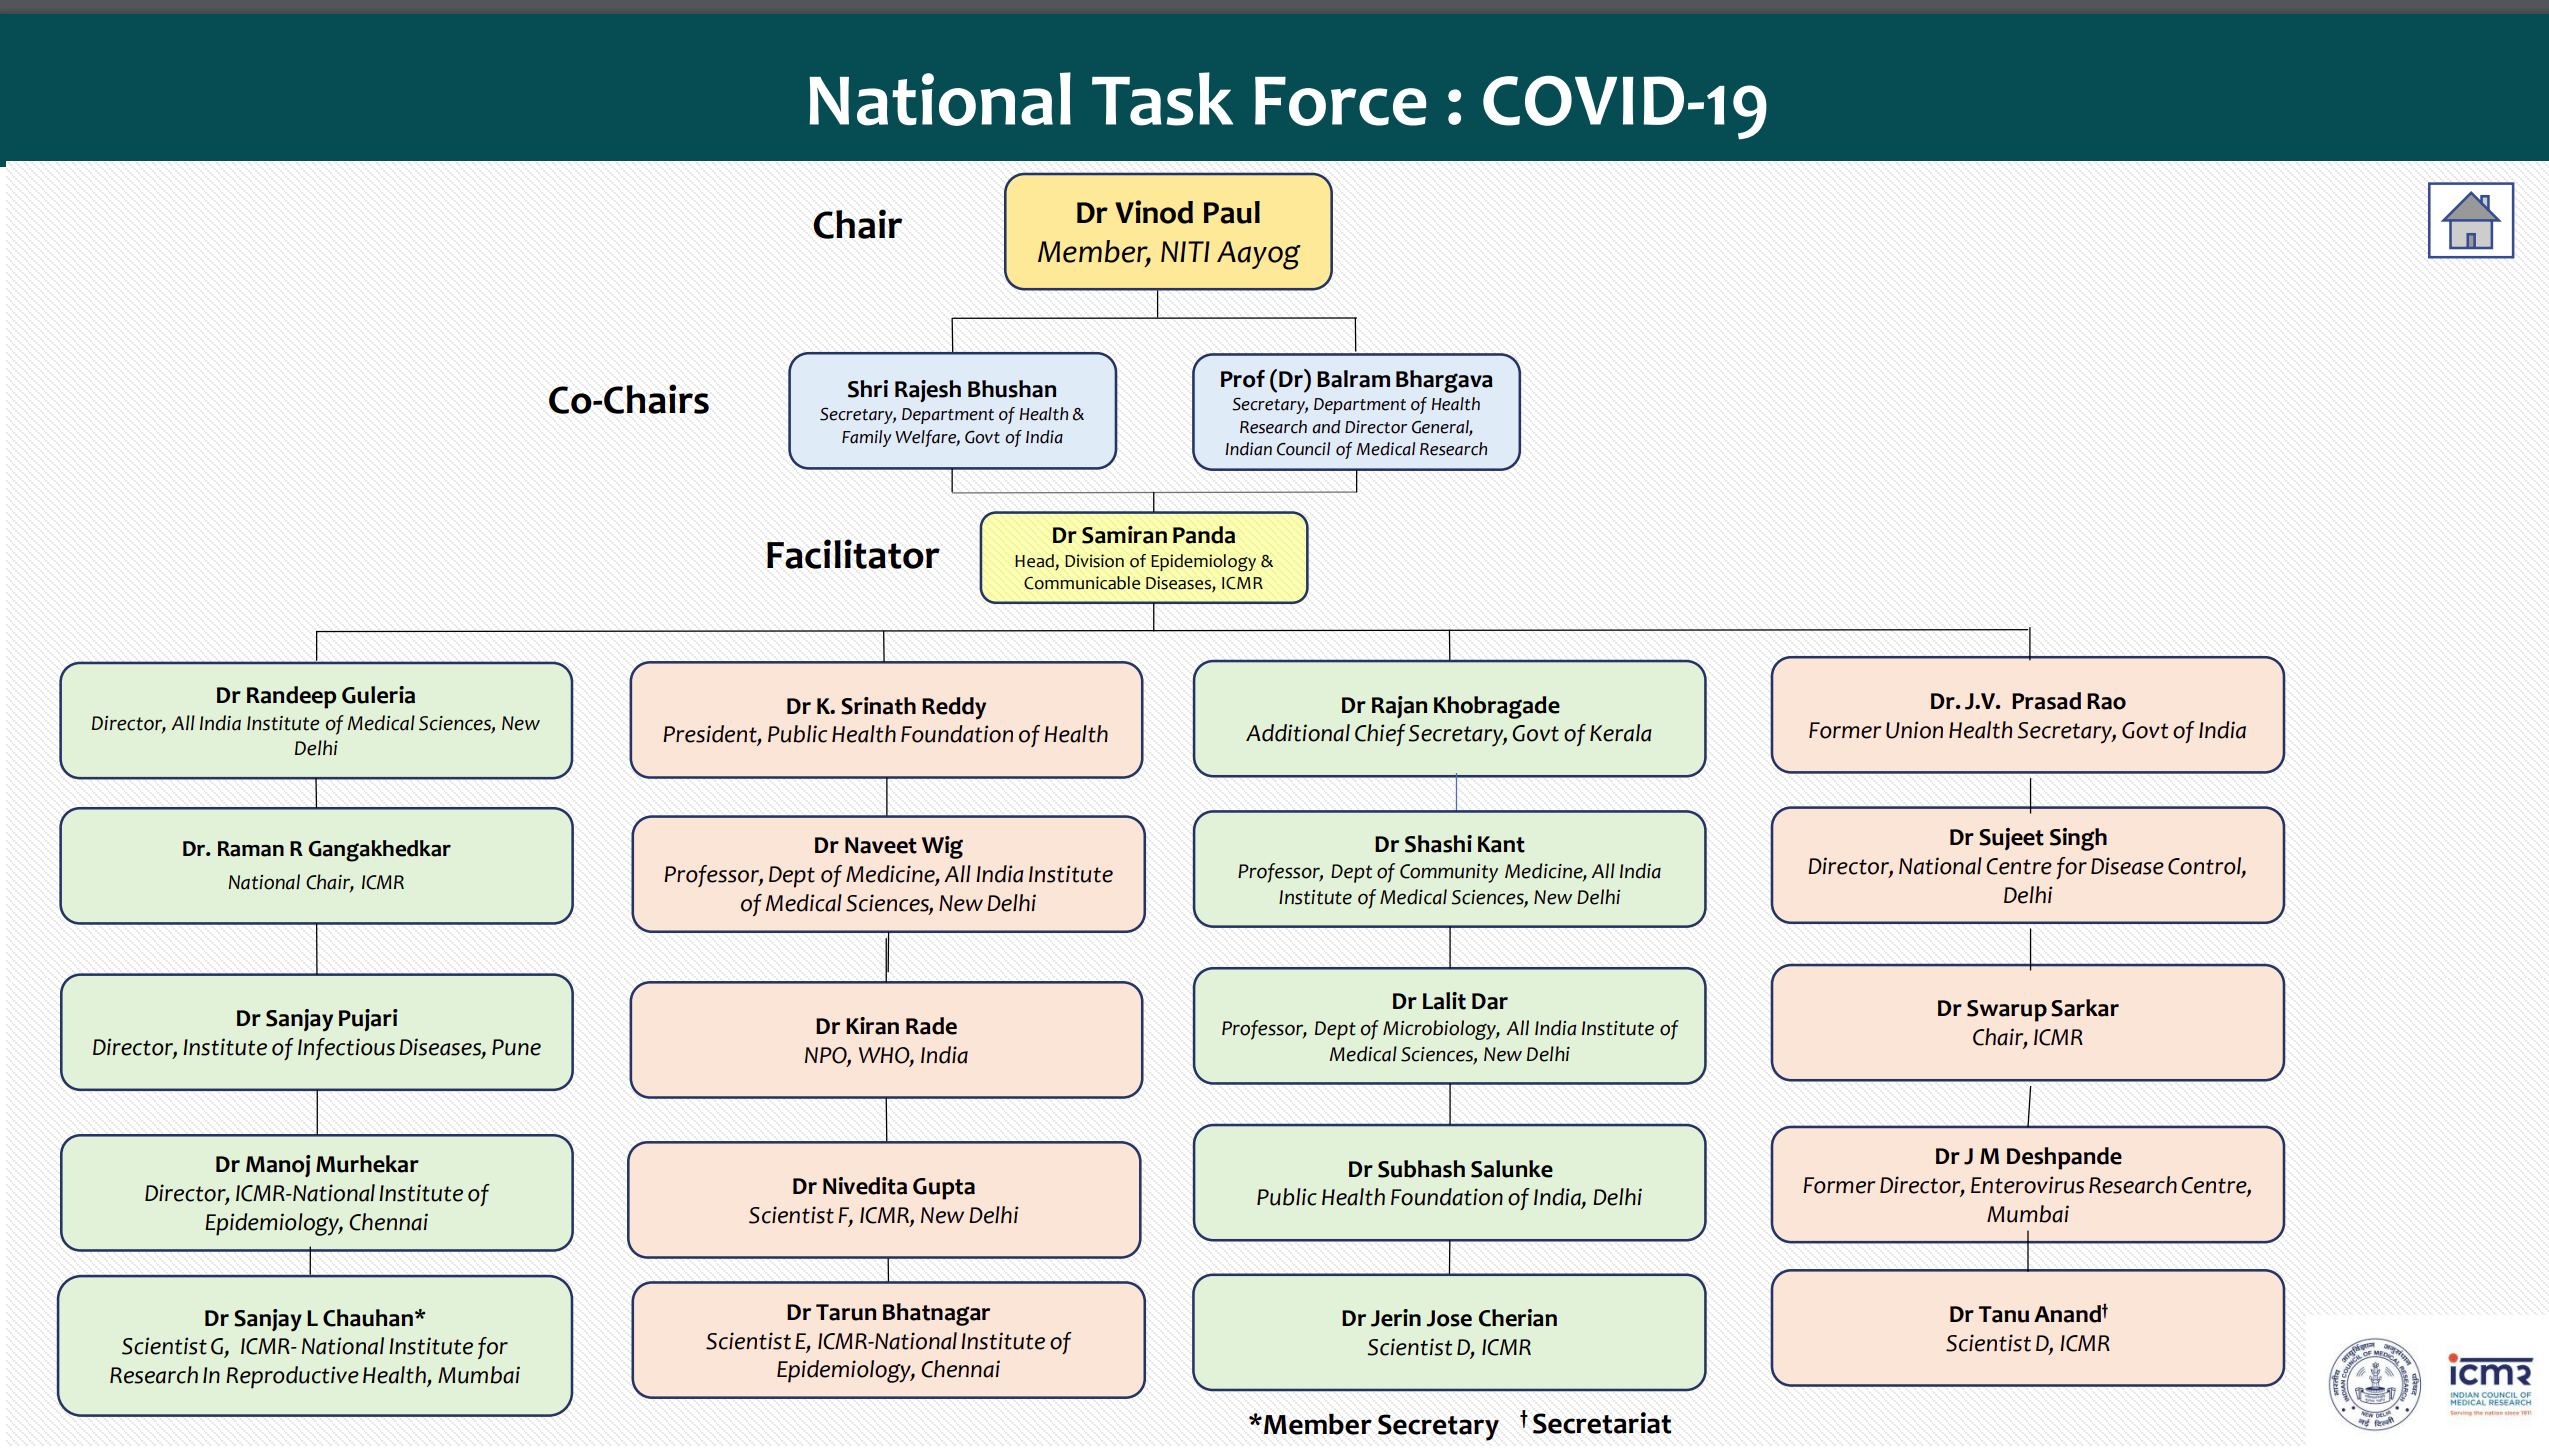 ICMR's Covid-19 Task Force